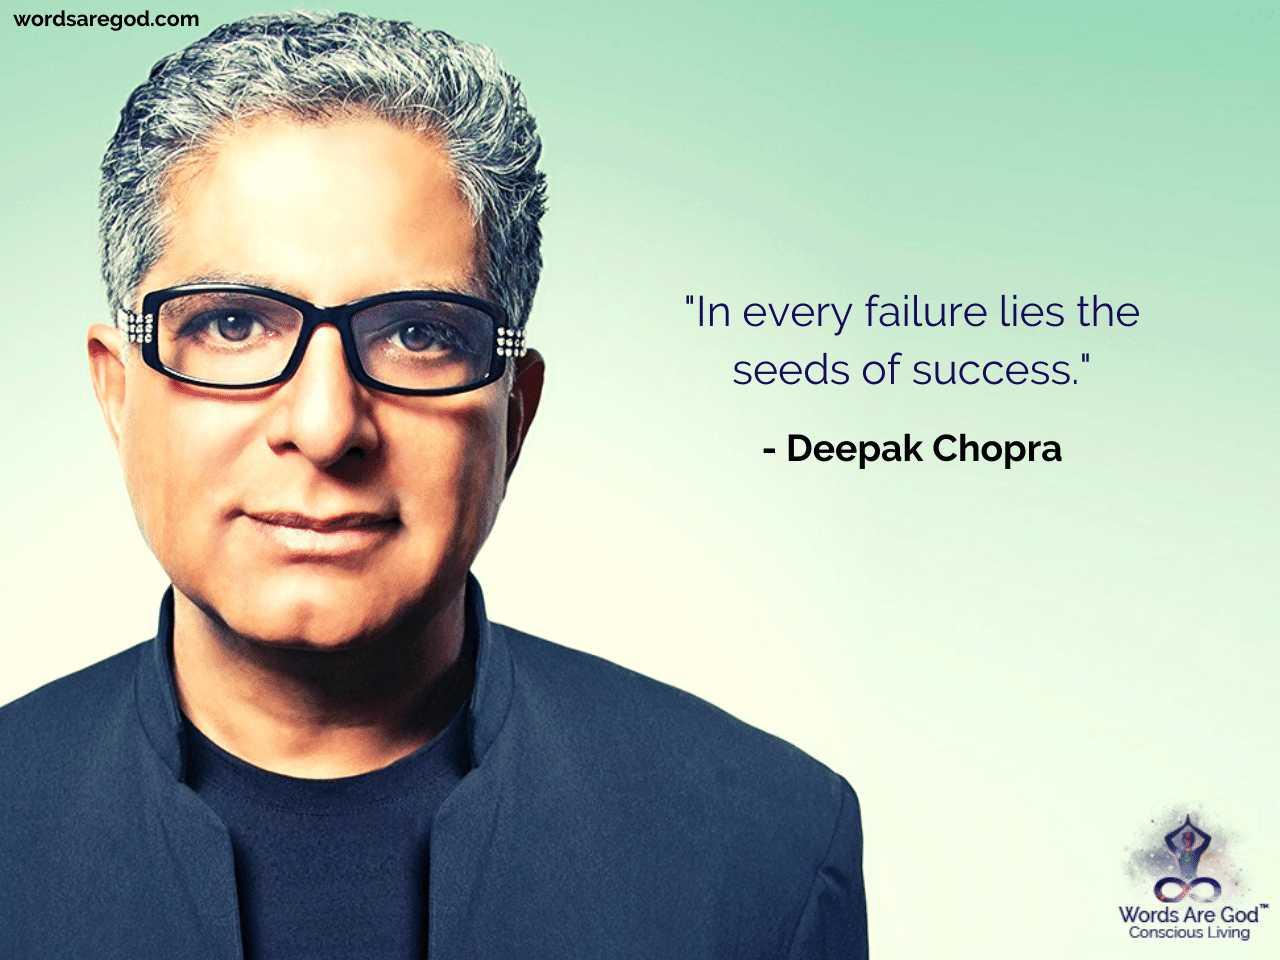 Deepak Chopra Life Quote